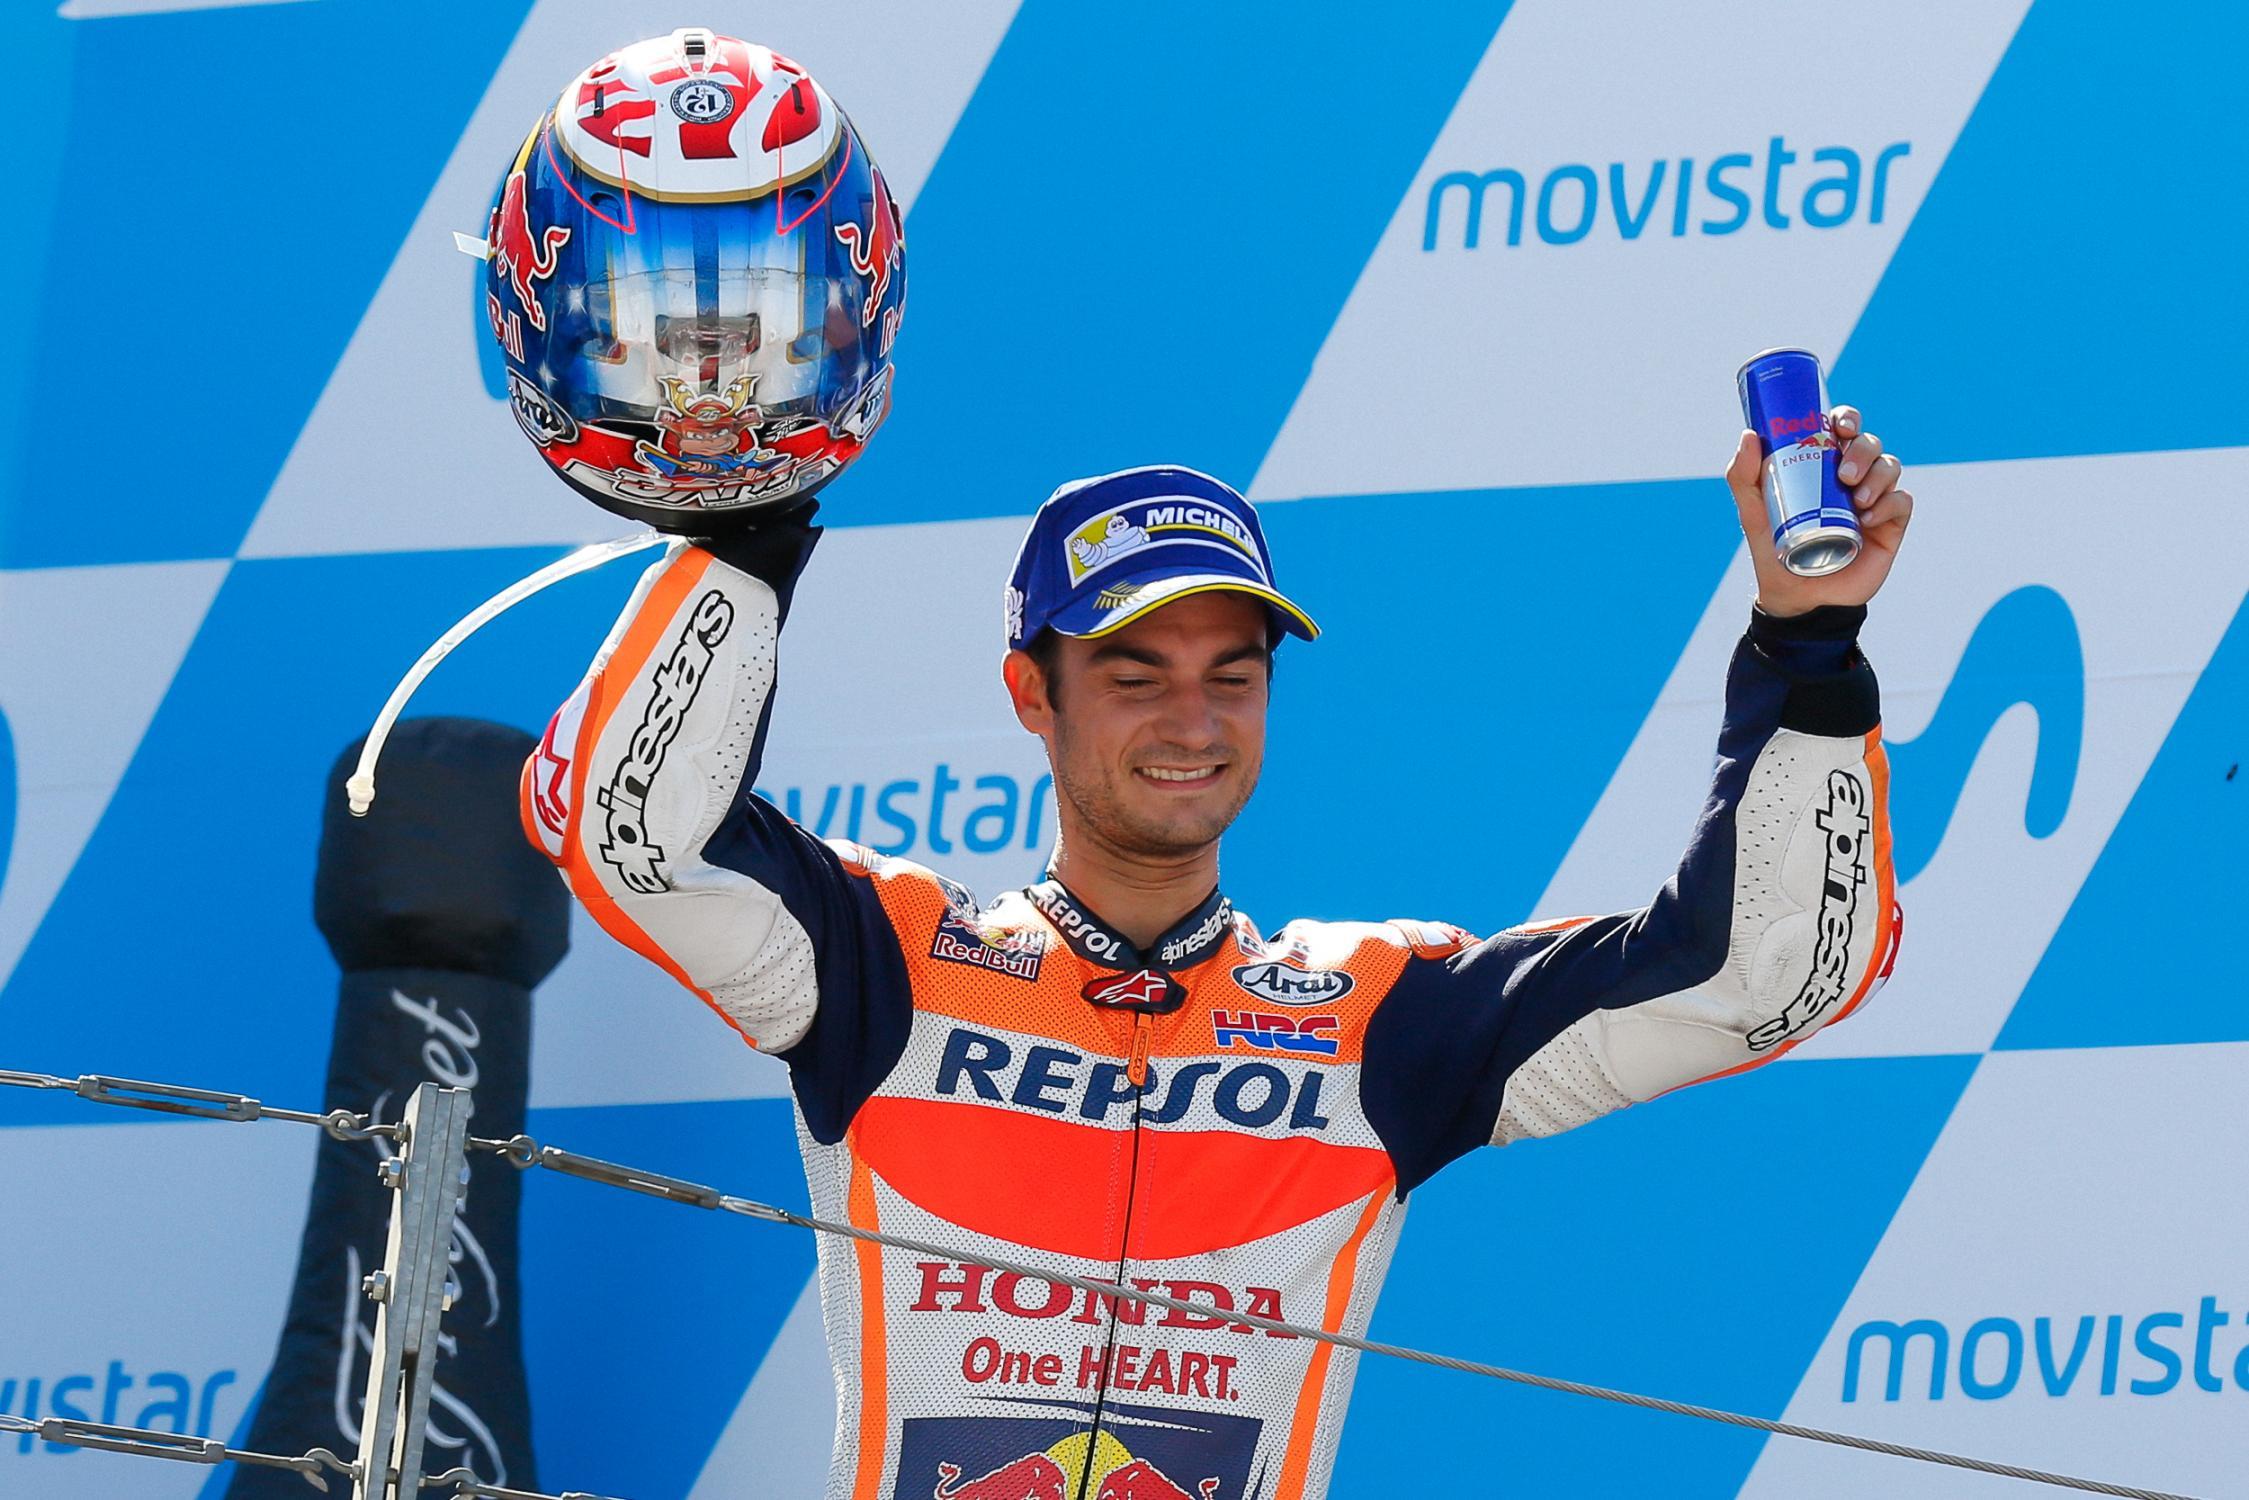 MOTO GP 2019 COMPÉTITIONS - Page 3 Dani-pedrosa-aragon-podium-motogp-2017